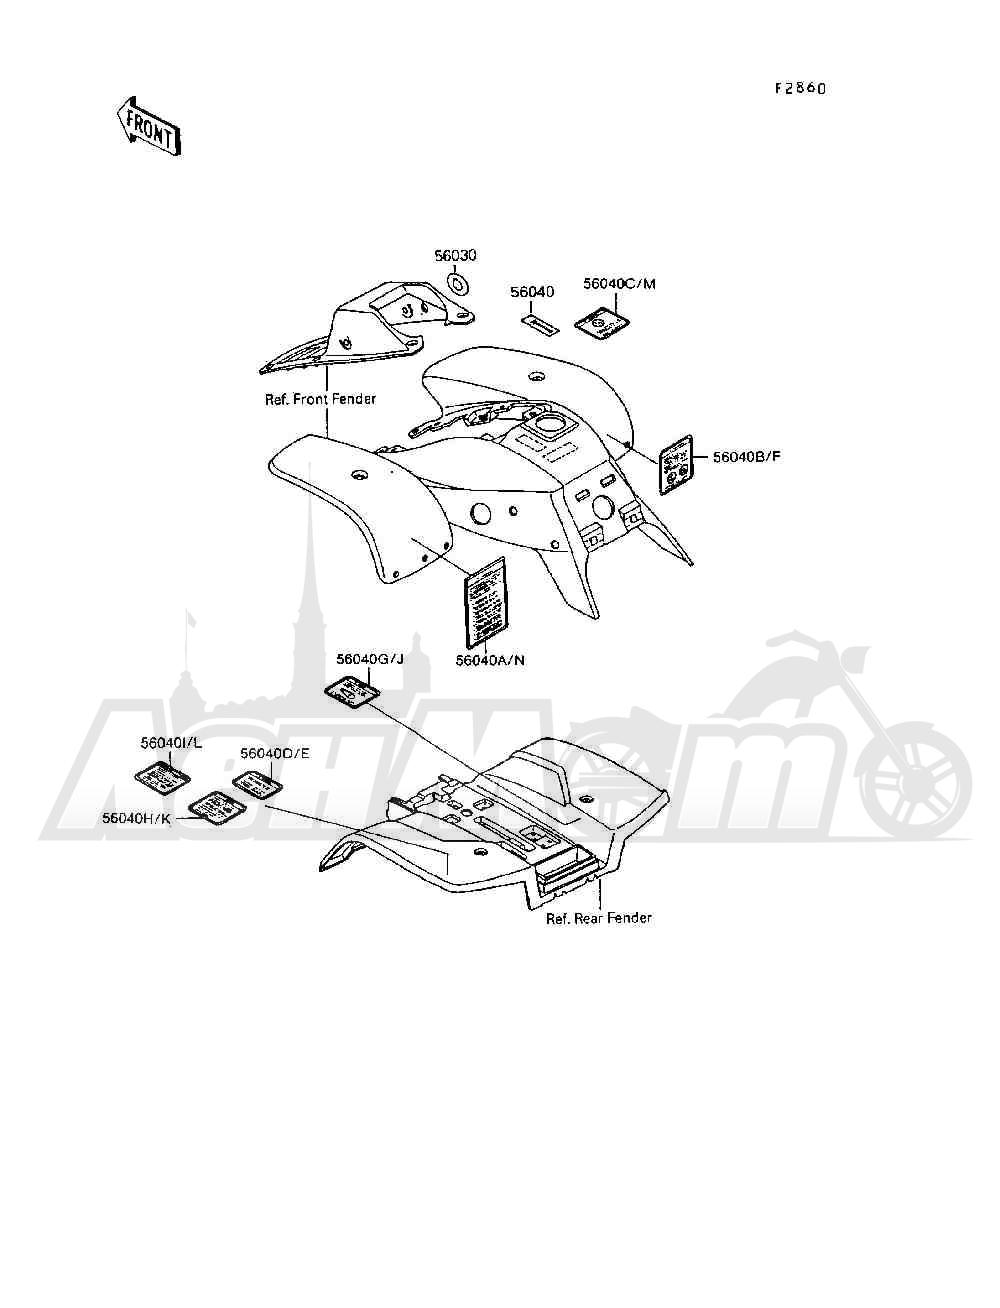 Запчасти для Квадроцикла Kawasaki 1994 MOJAVE 250 (KSF250-A8) Раздел: LABELS | этикетки, метки